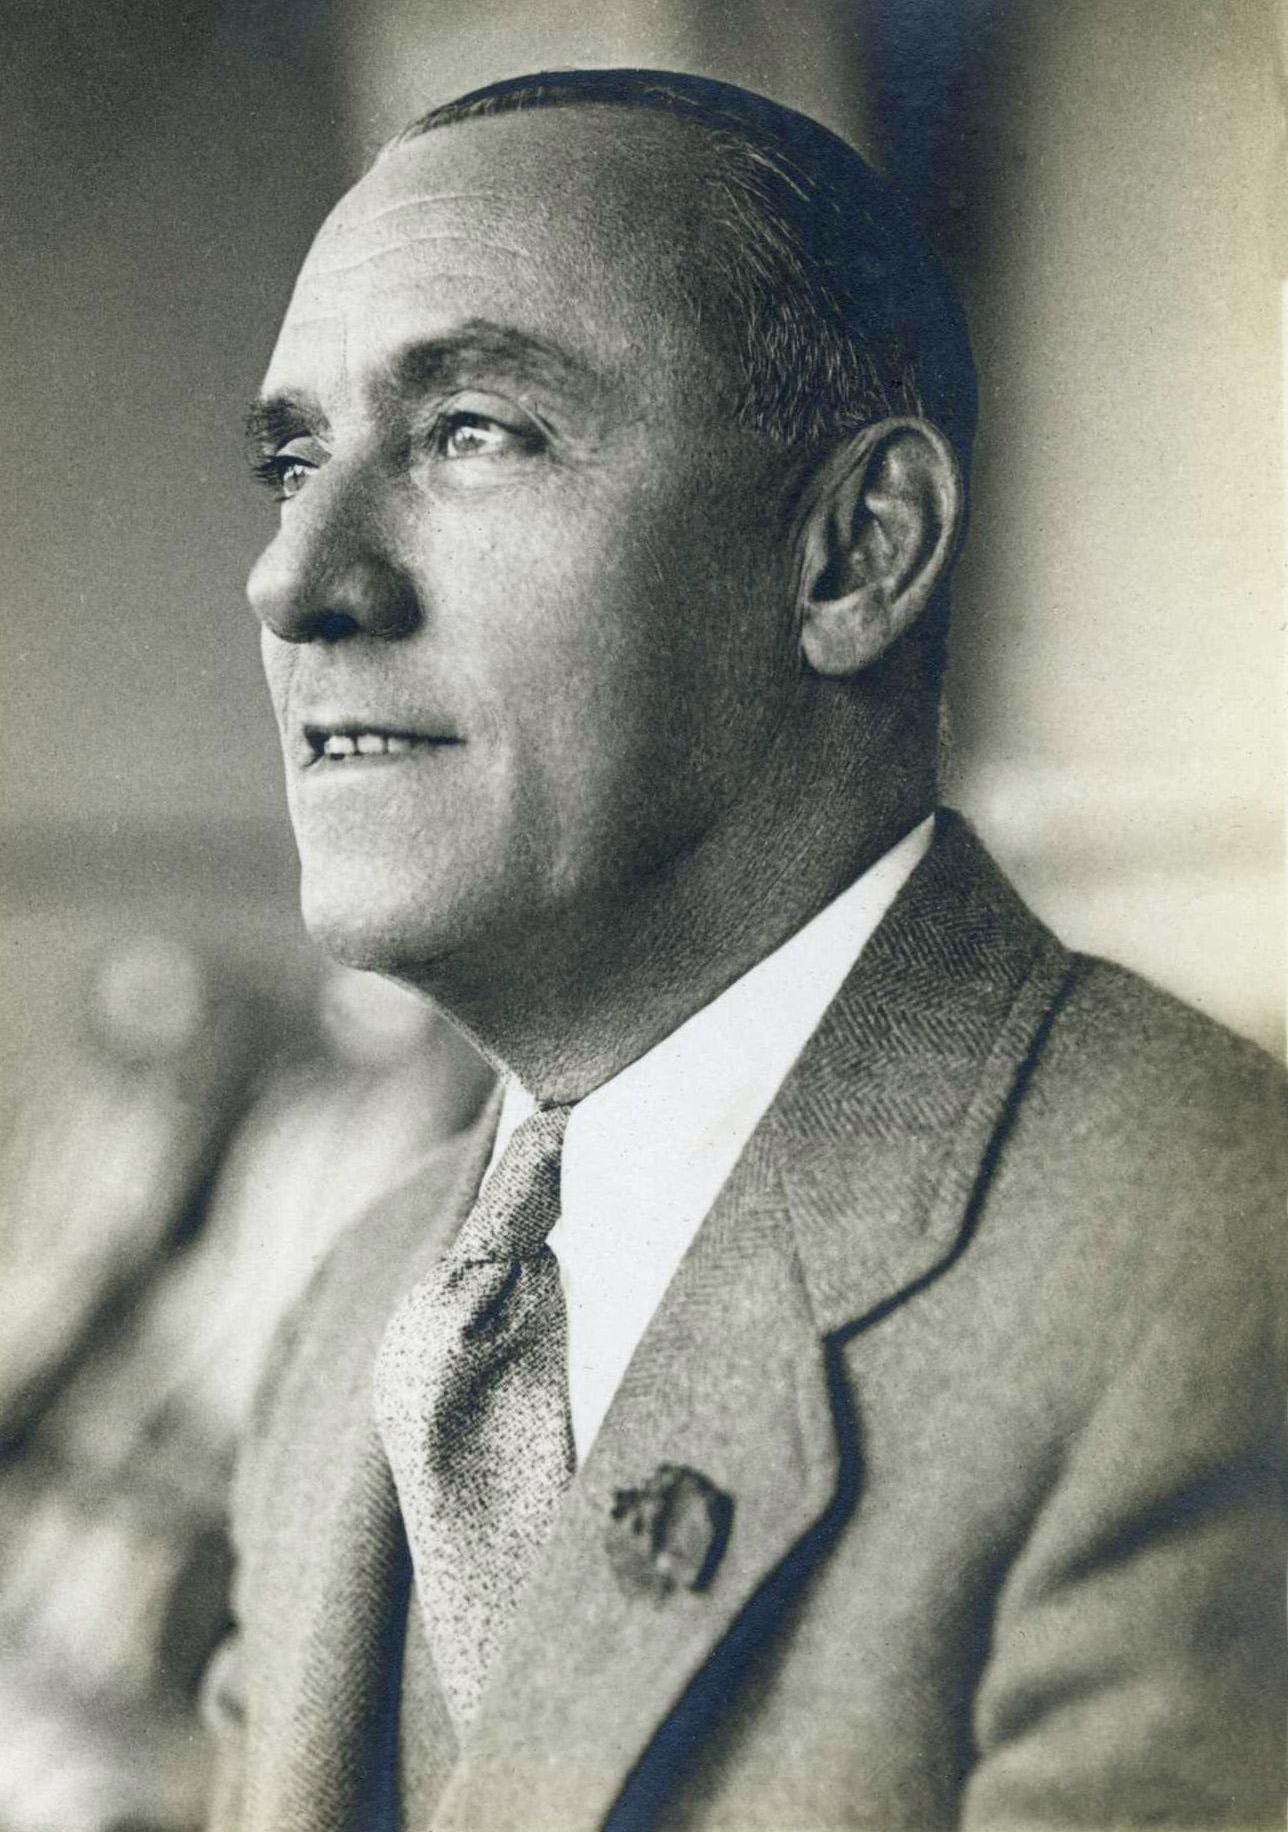 Louis Stone of A.E.